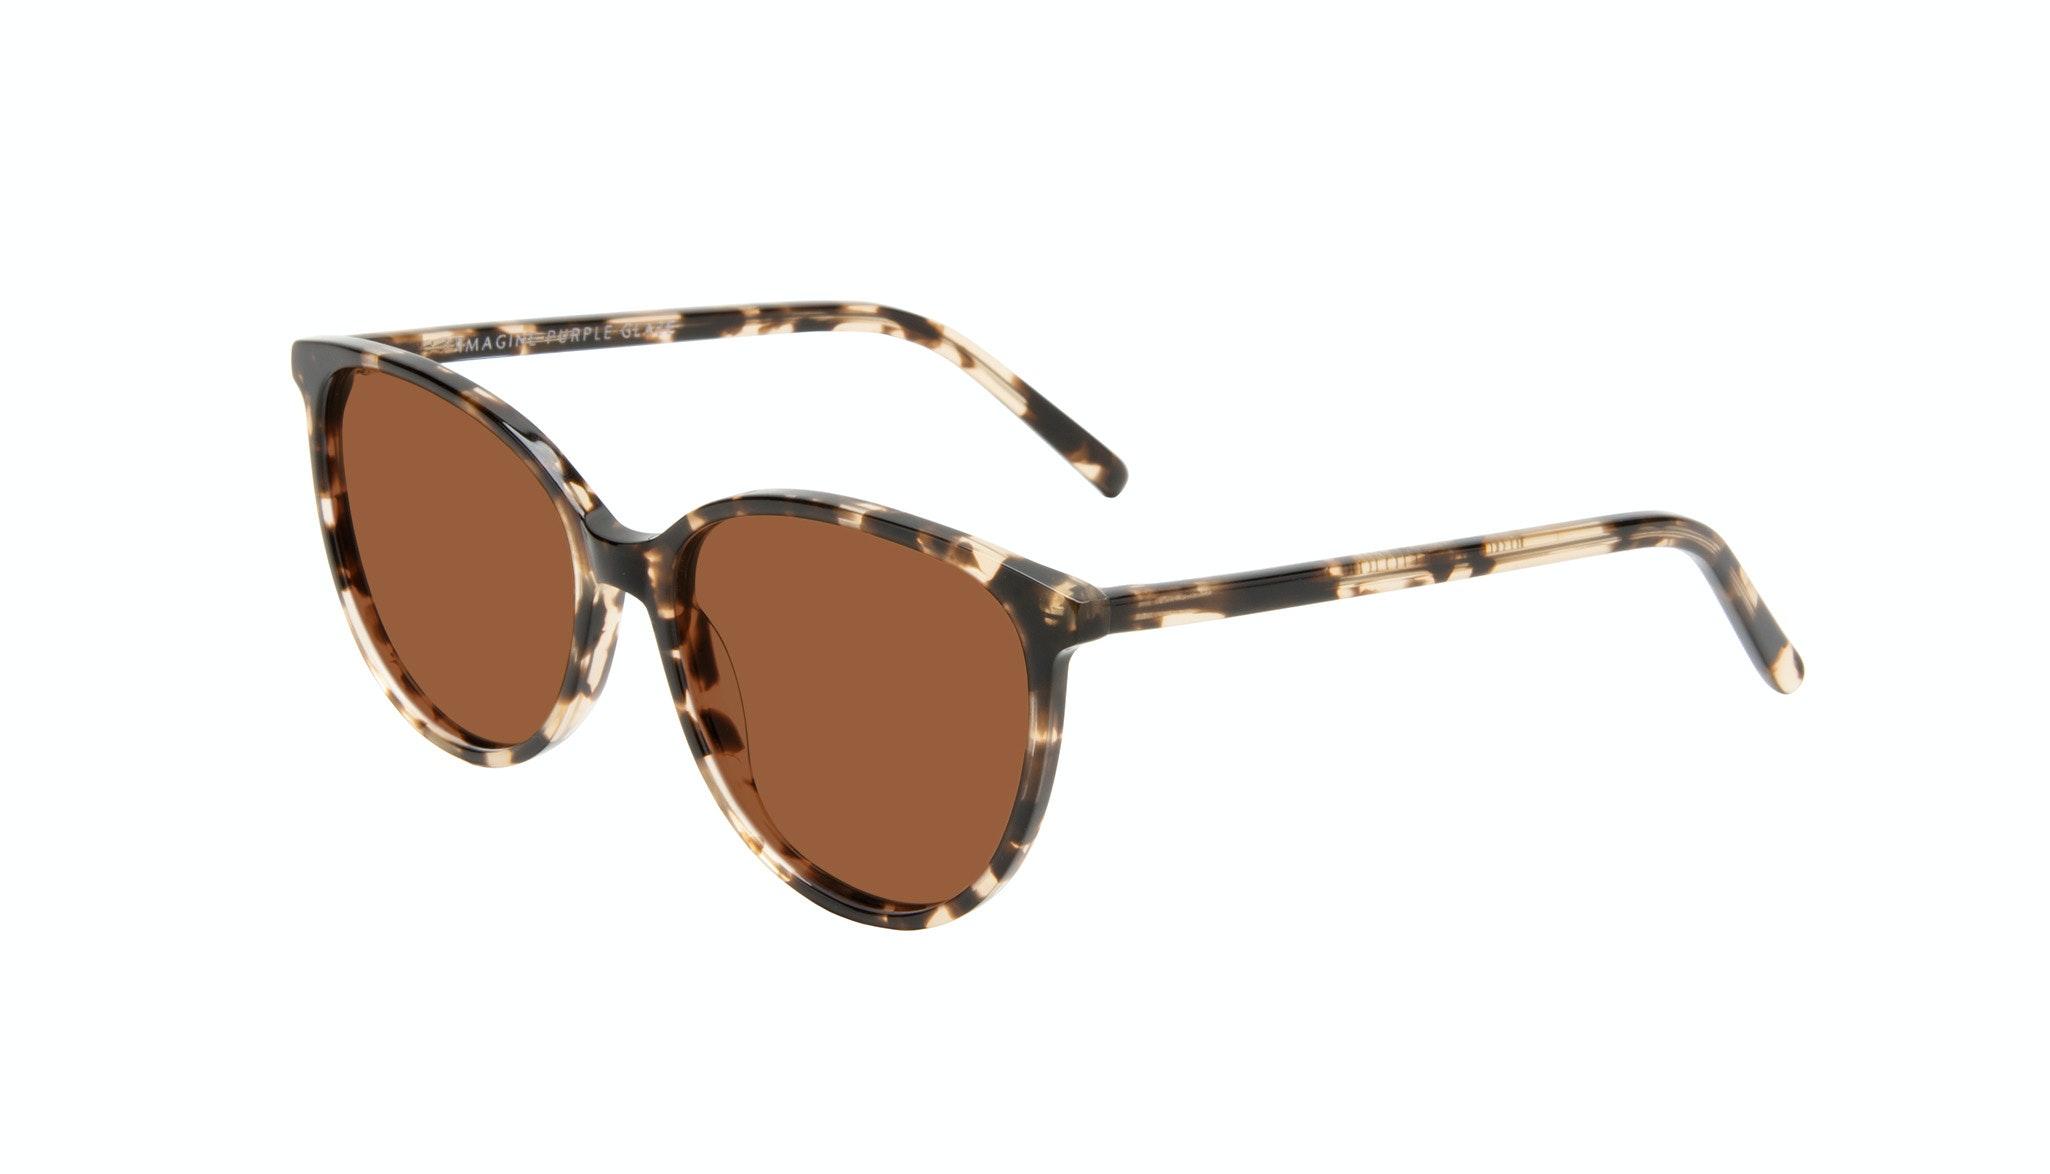 Affordable Fashion Glasses Round Sunglasses Women Imagine Purple Glaze Tilt